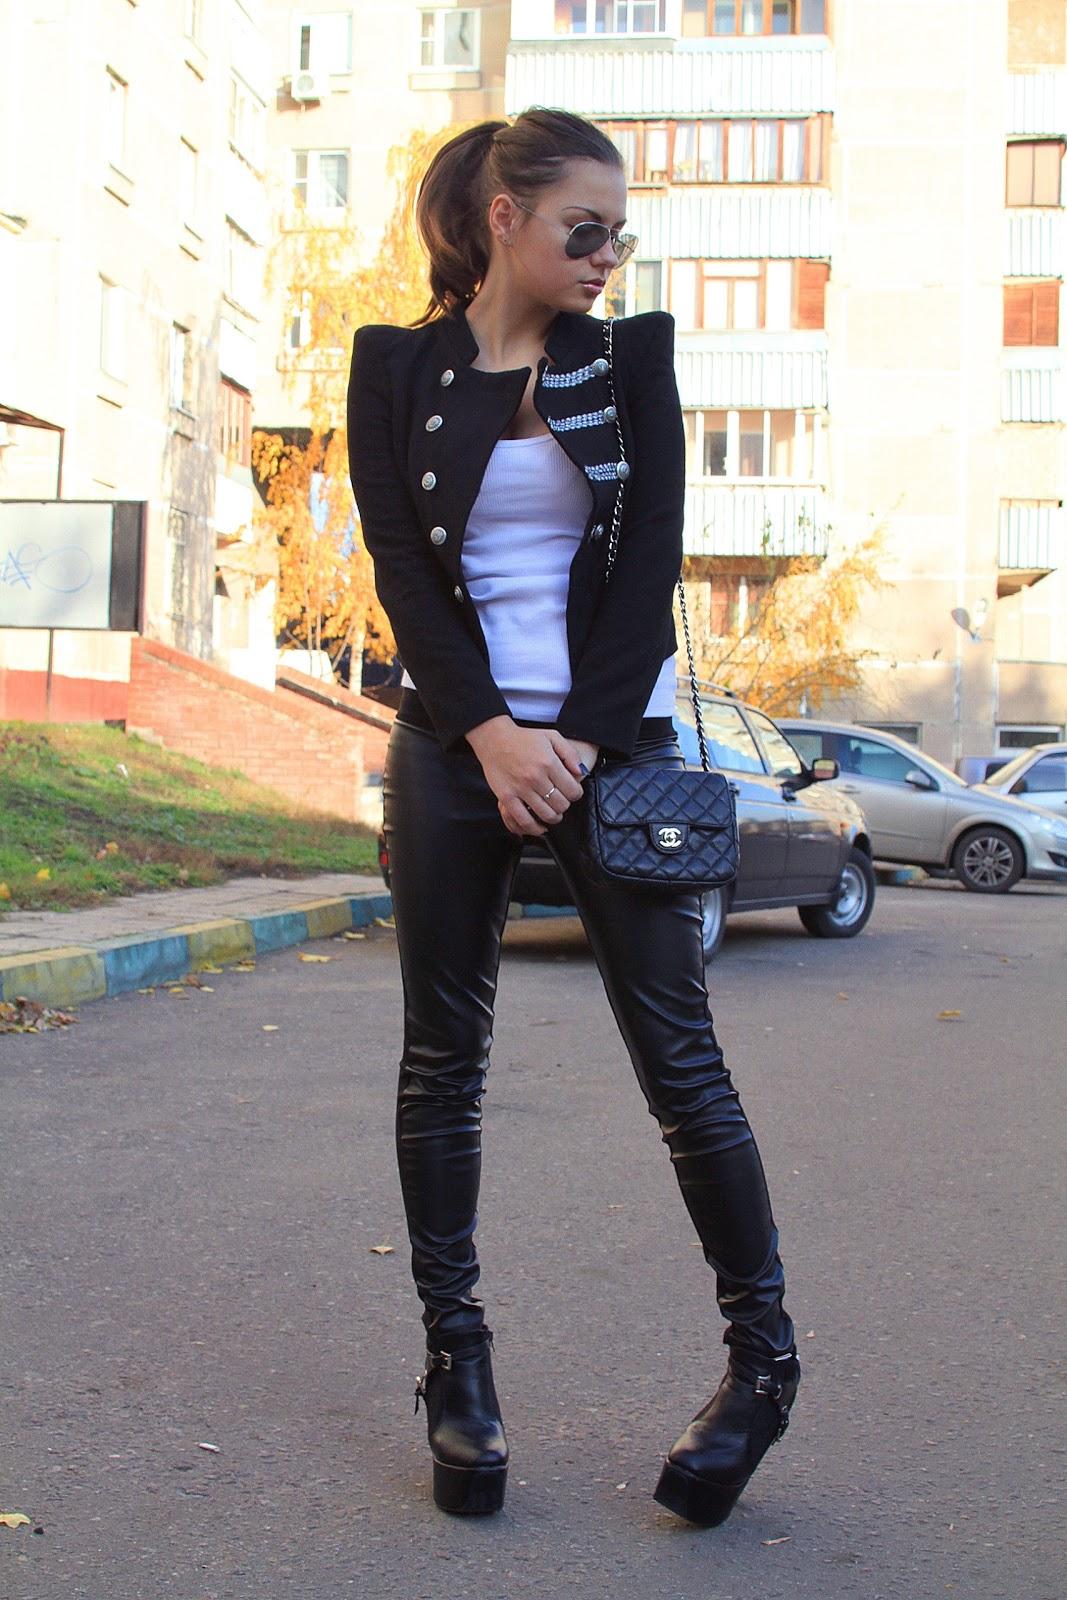 Фетиш белые носочки 23 фотография